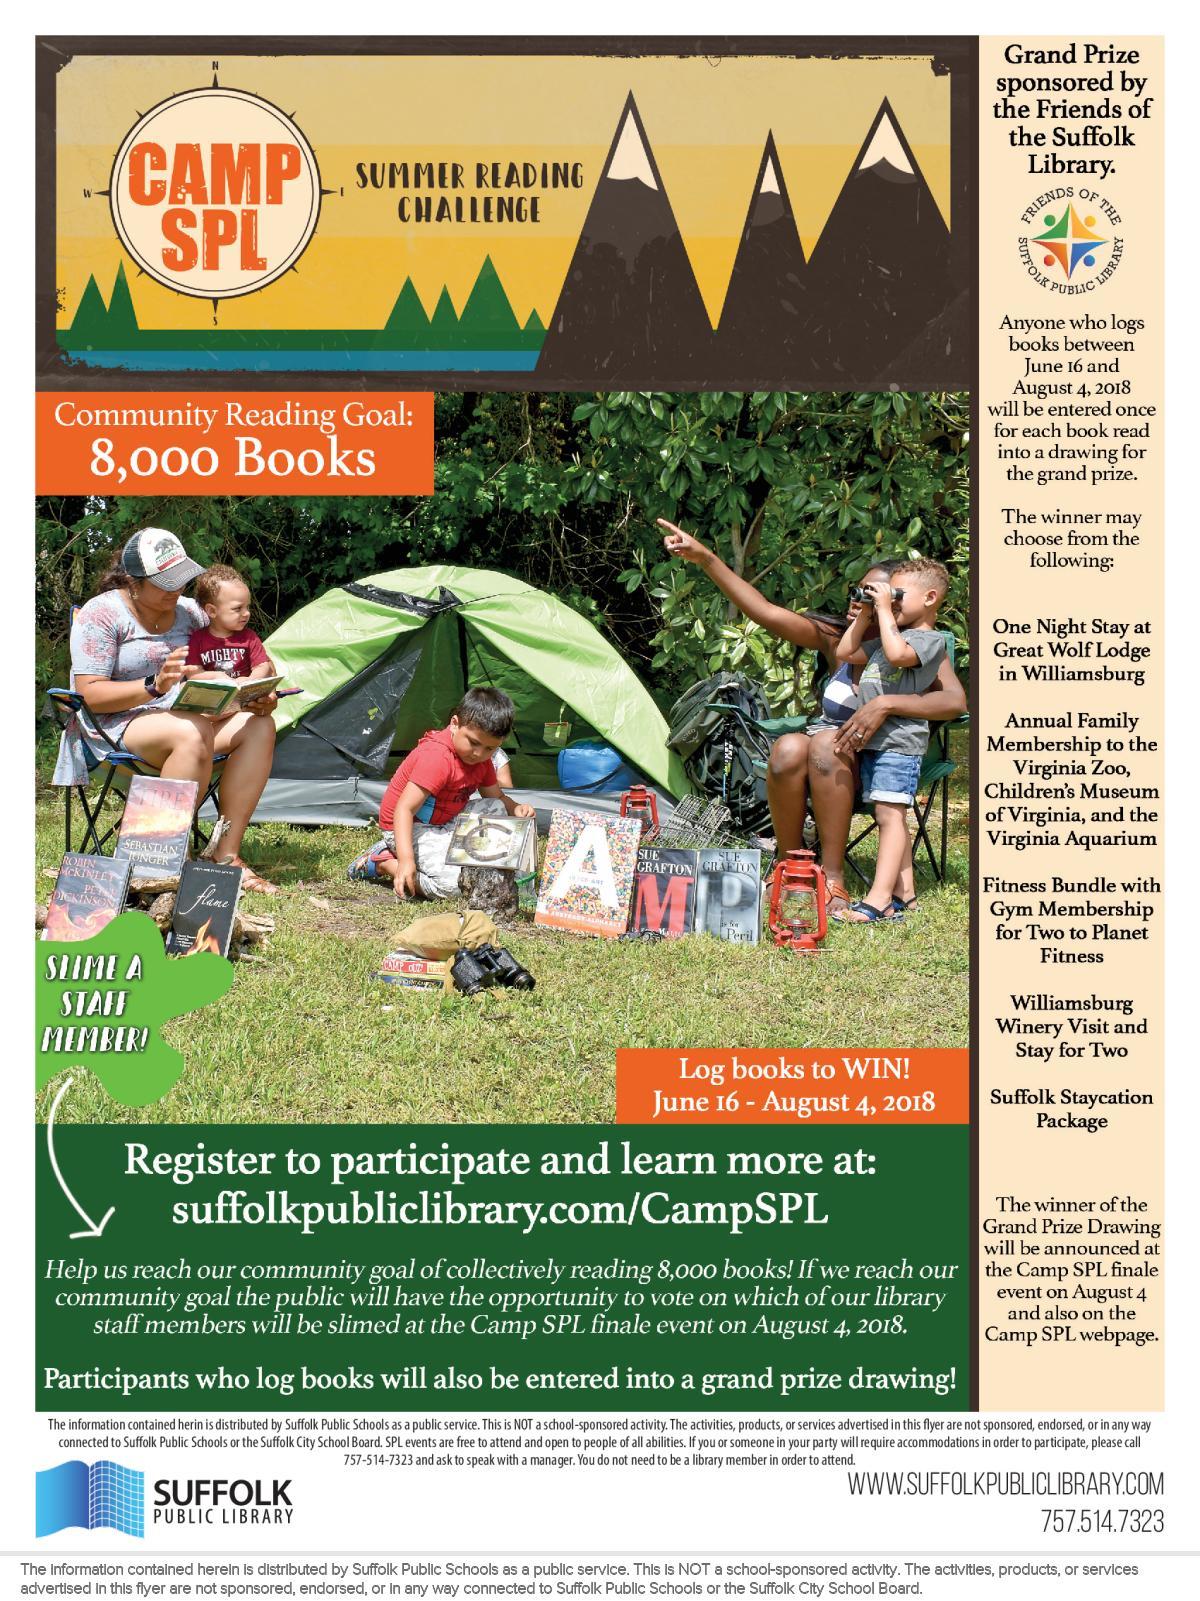 Image of a flyer titled Camp SPL Summer Reading Challenge